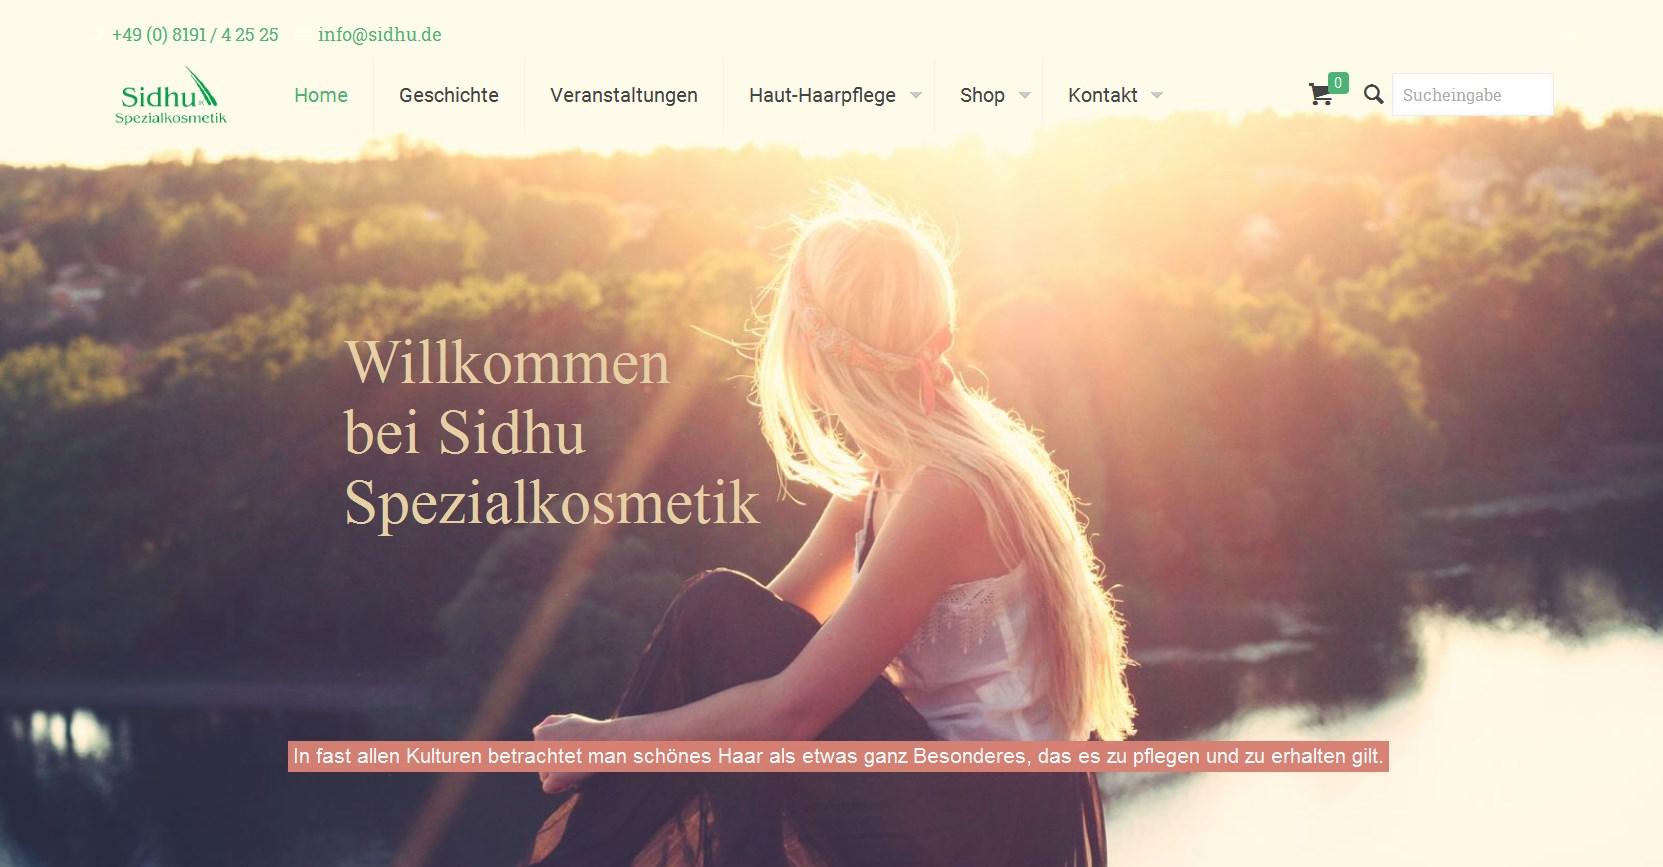 SIDHU_Spezialkosmetik